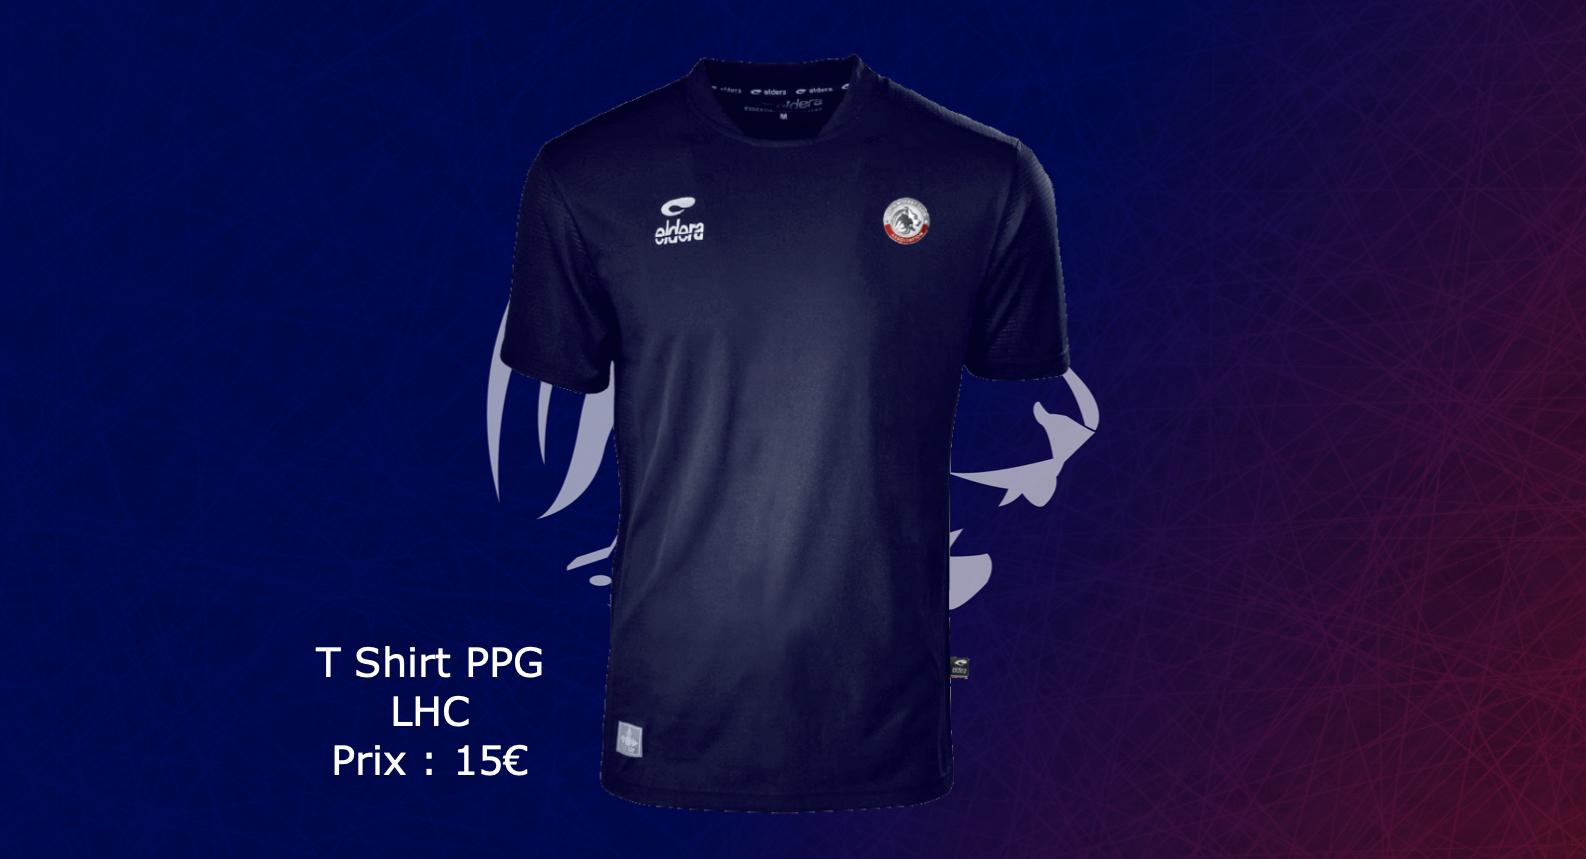 T Shirt PPG